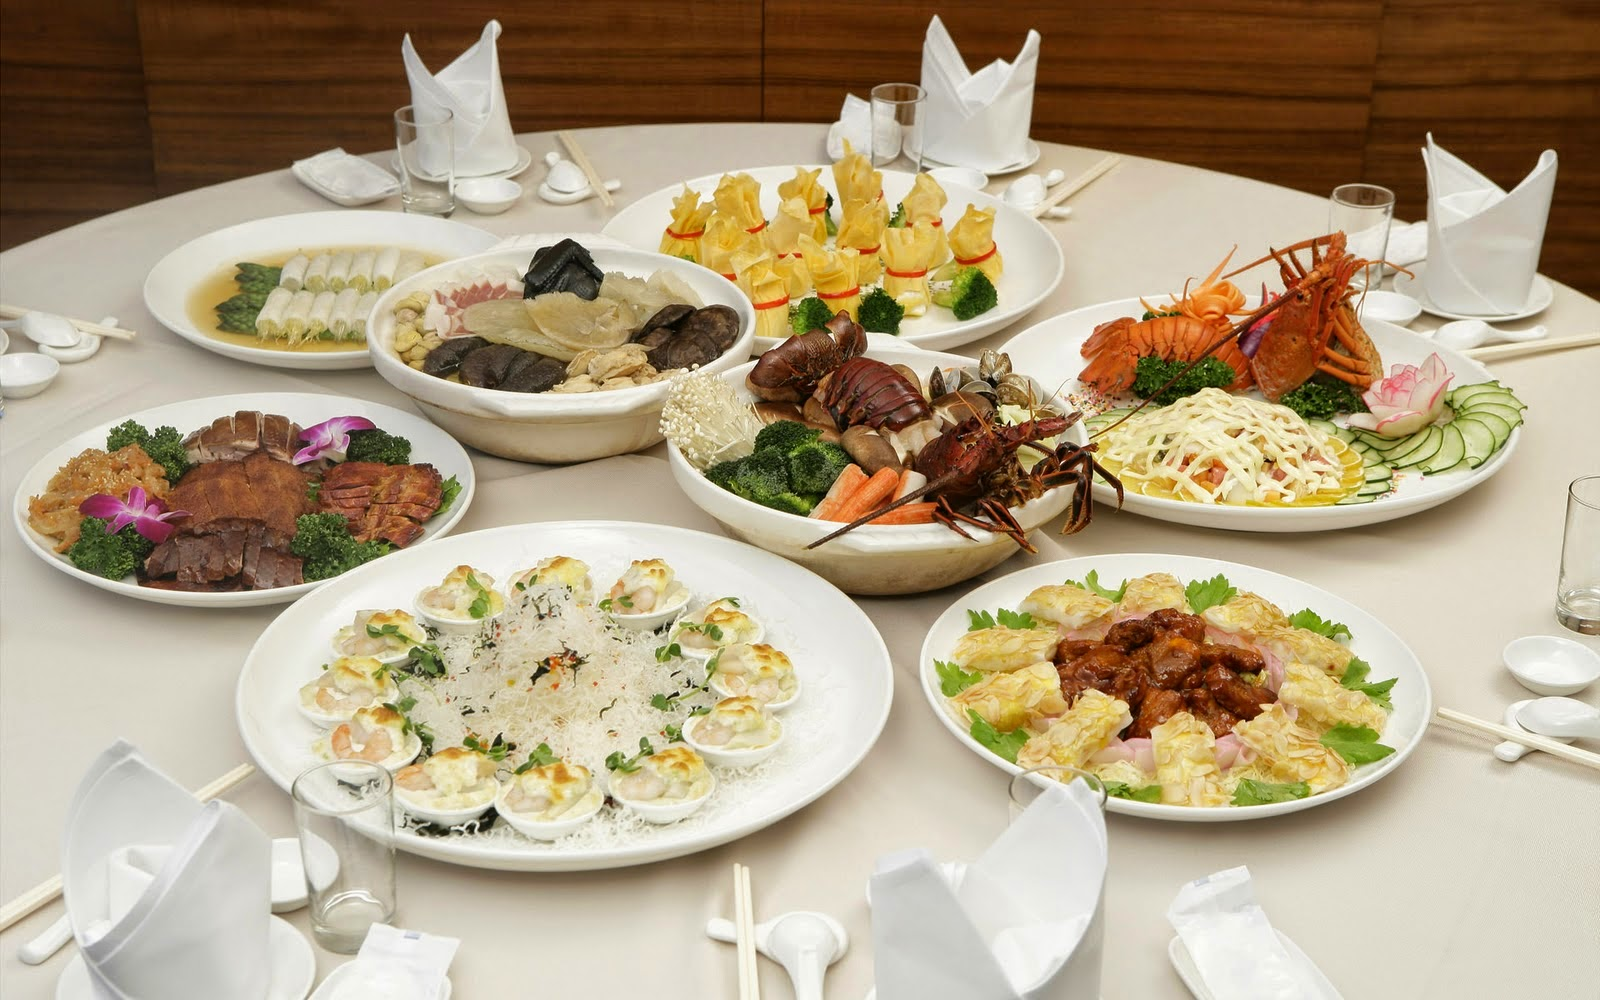 صور صور مائدة طعام , افكار ل مائده الطعام